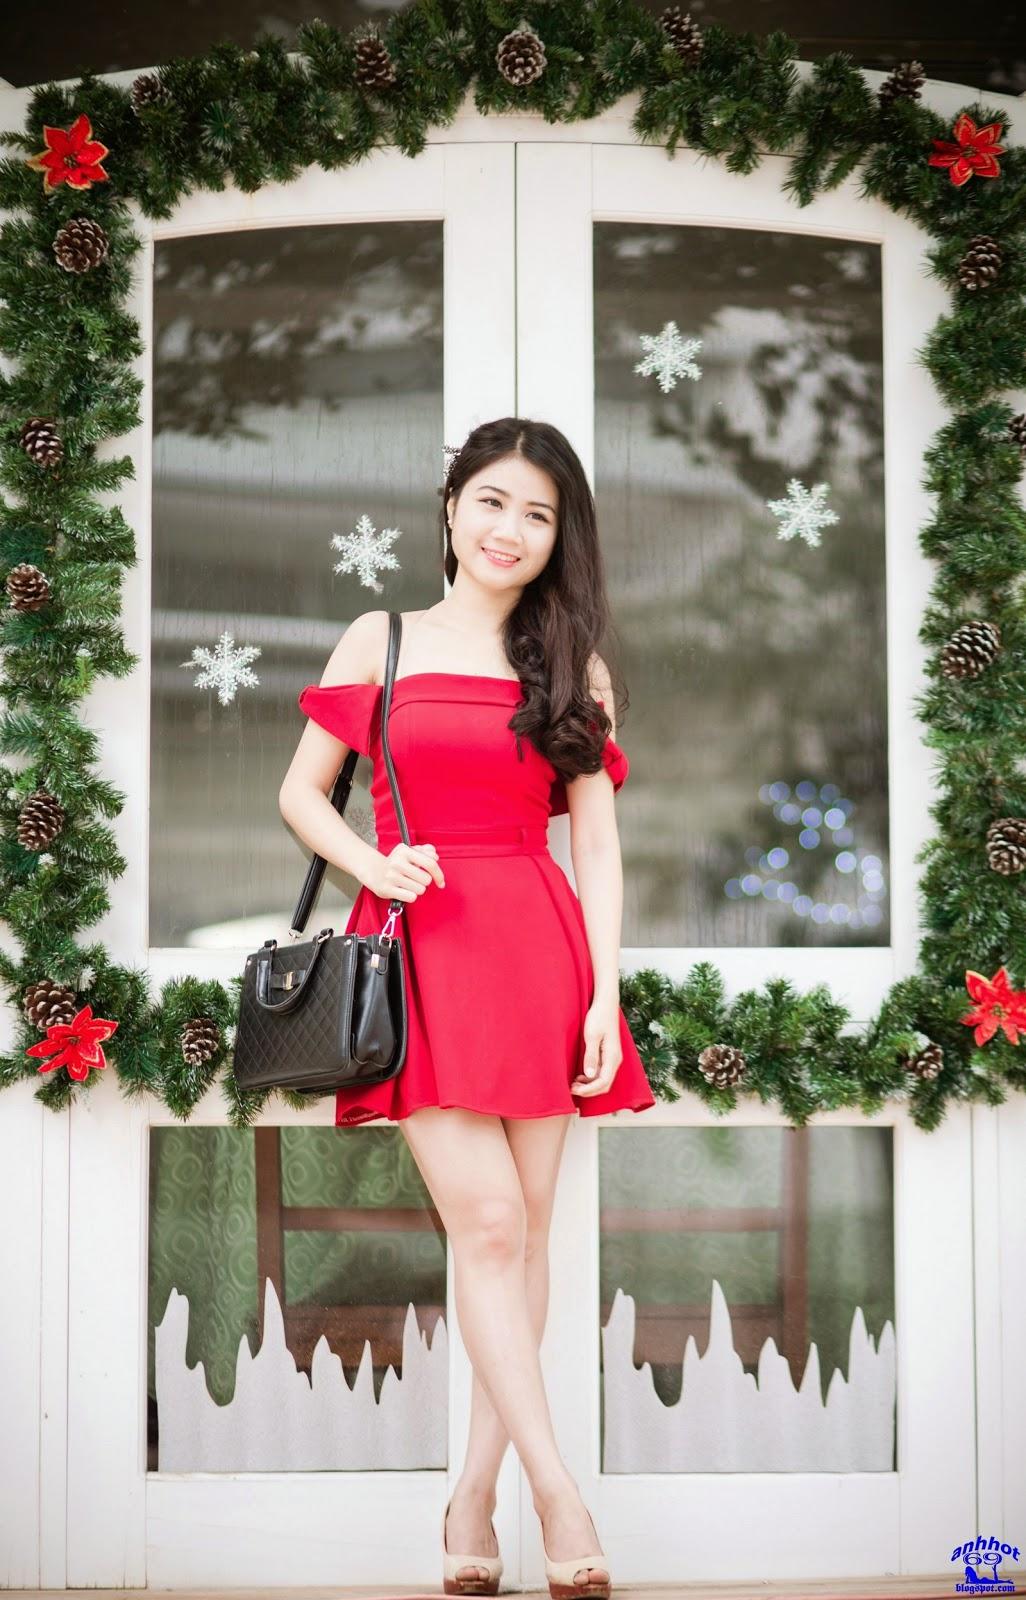 merry-christmas_1412251540_01